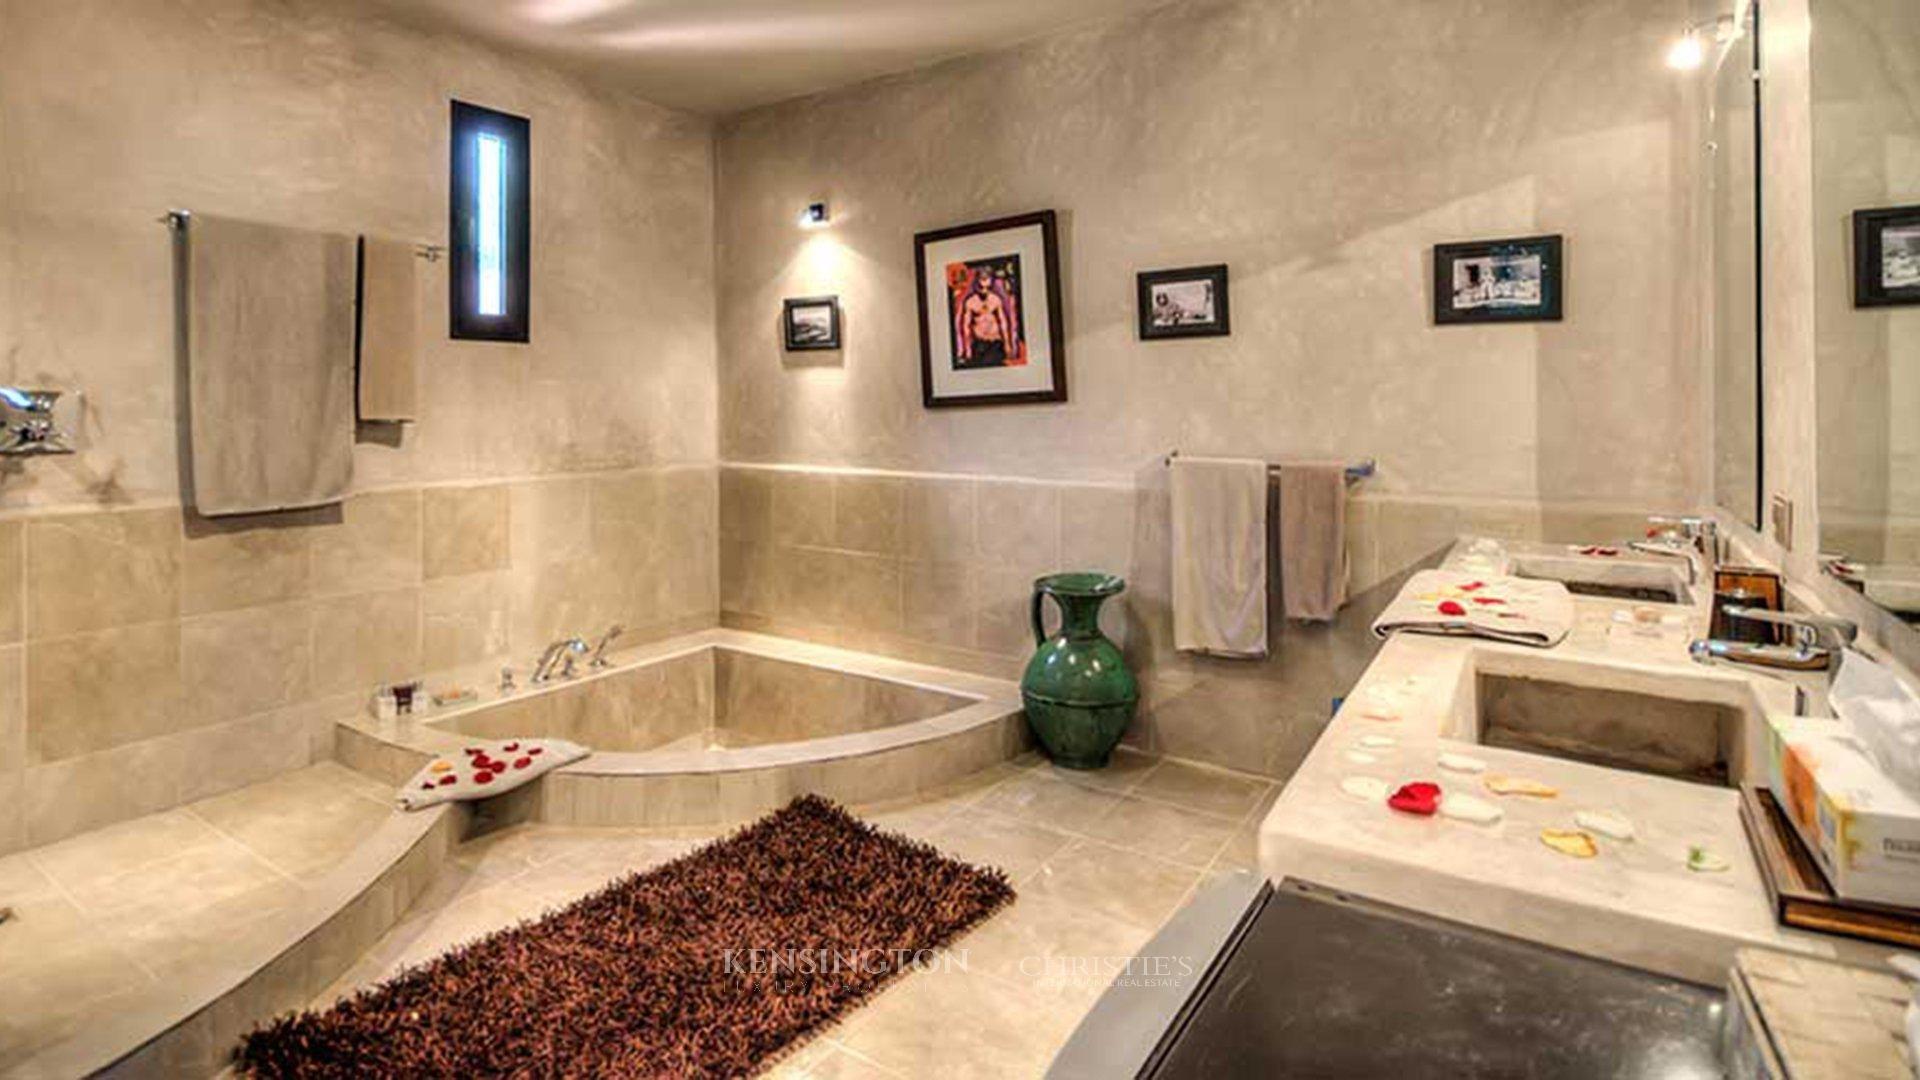 KPPM00820: Villa Sabra Luxury Villa Marrakech Morocco